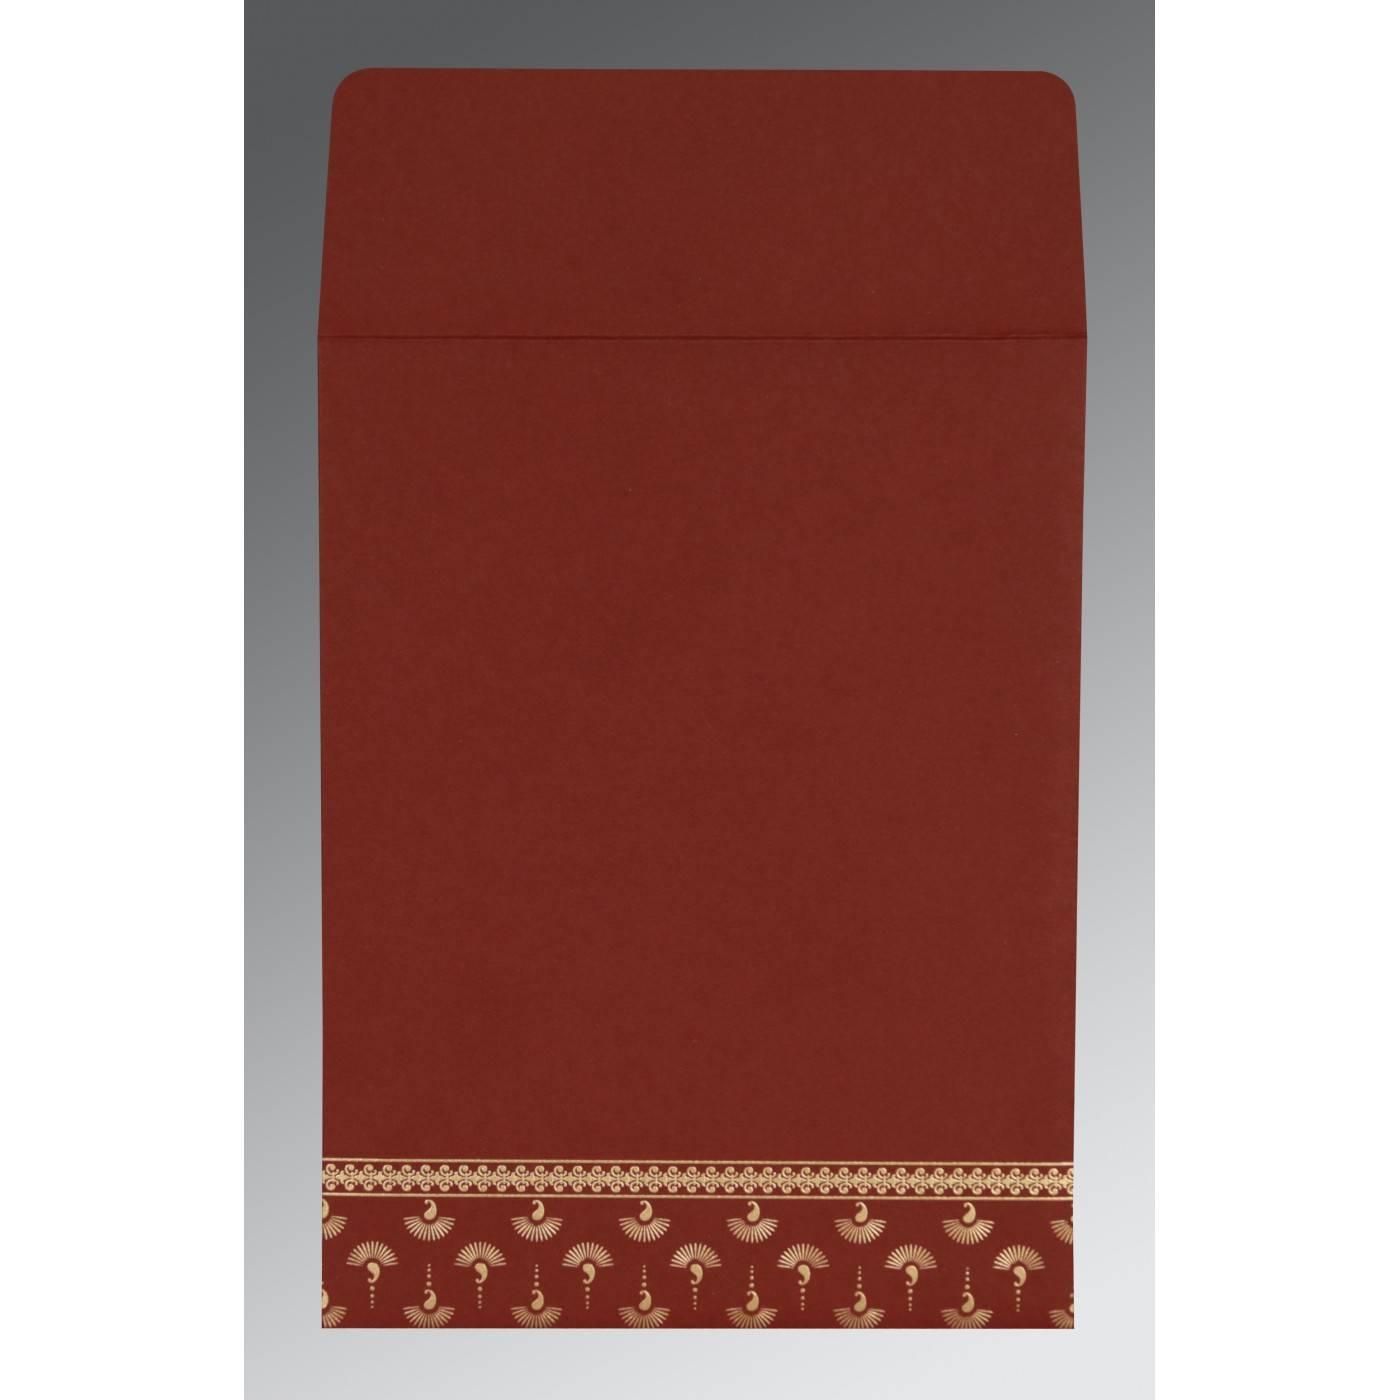 MAROON MATTE SCREEN PRINTED WEDDING INVITATION : CI-8247D - IndianWeddingCards